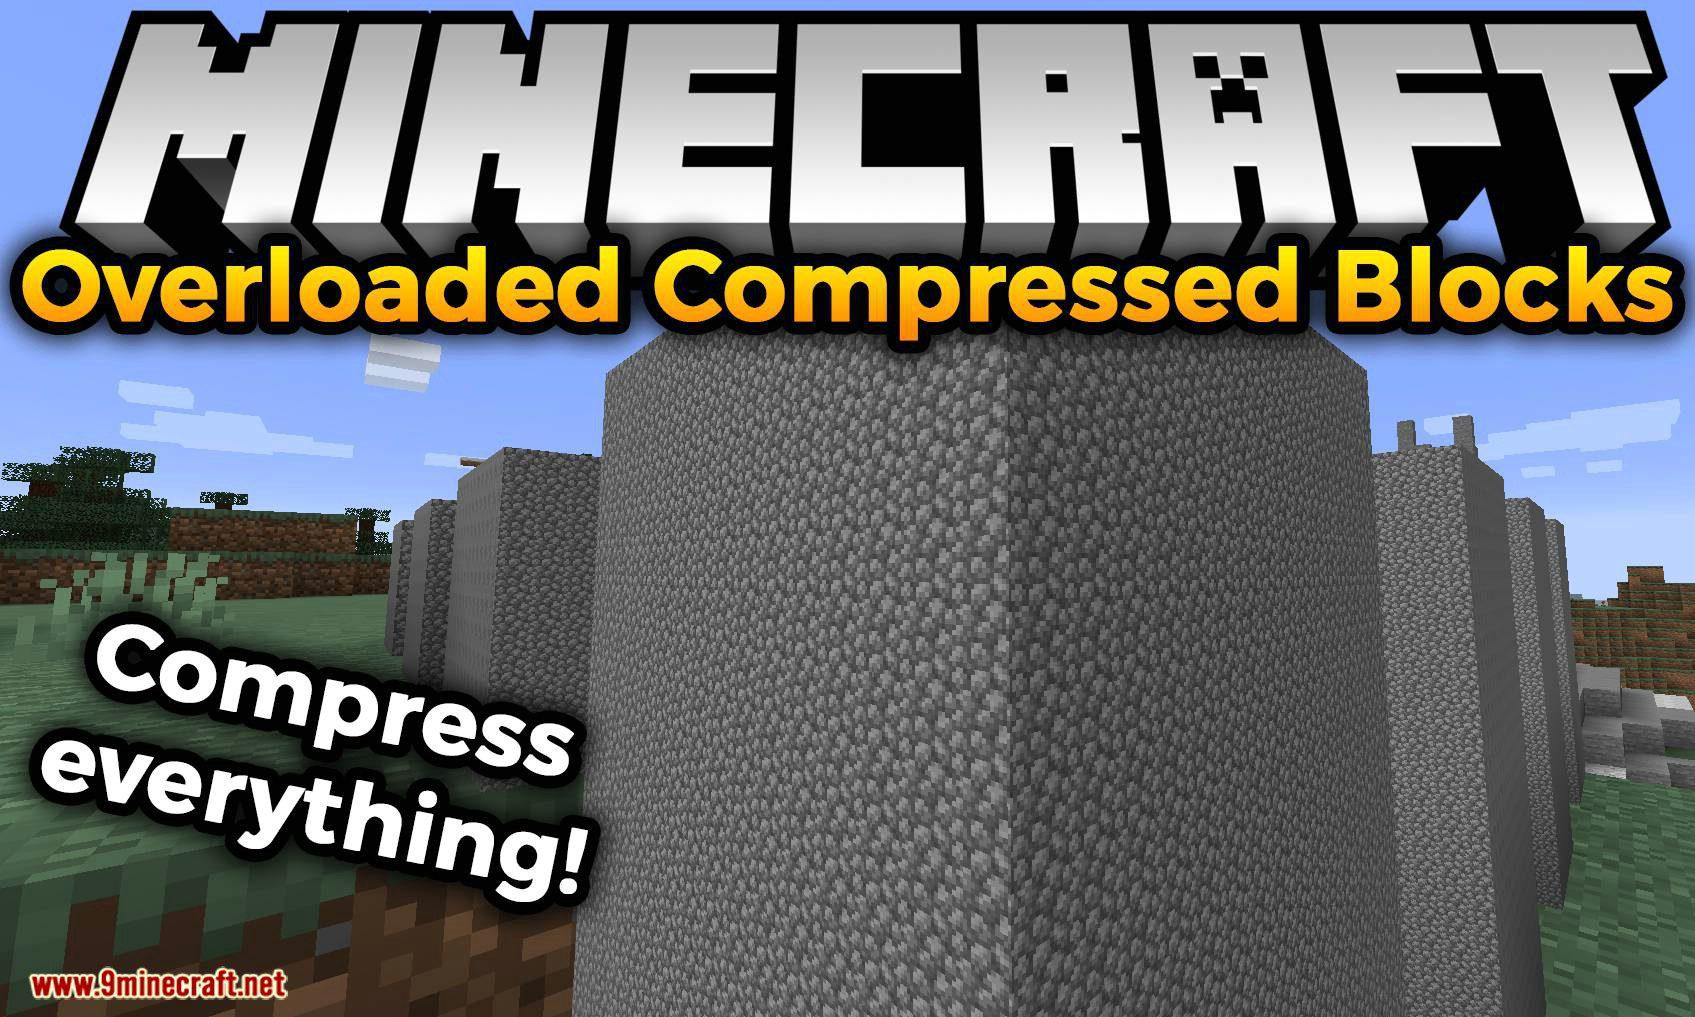 Overloaded Compressed Blocks mod for minecraft logo